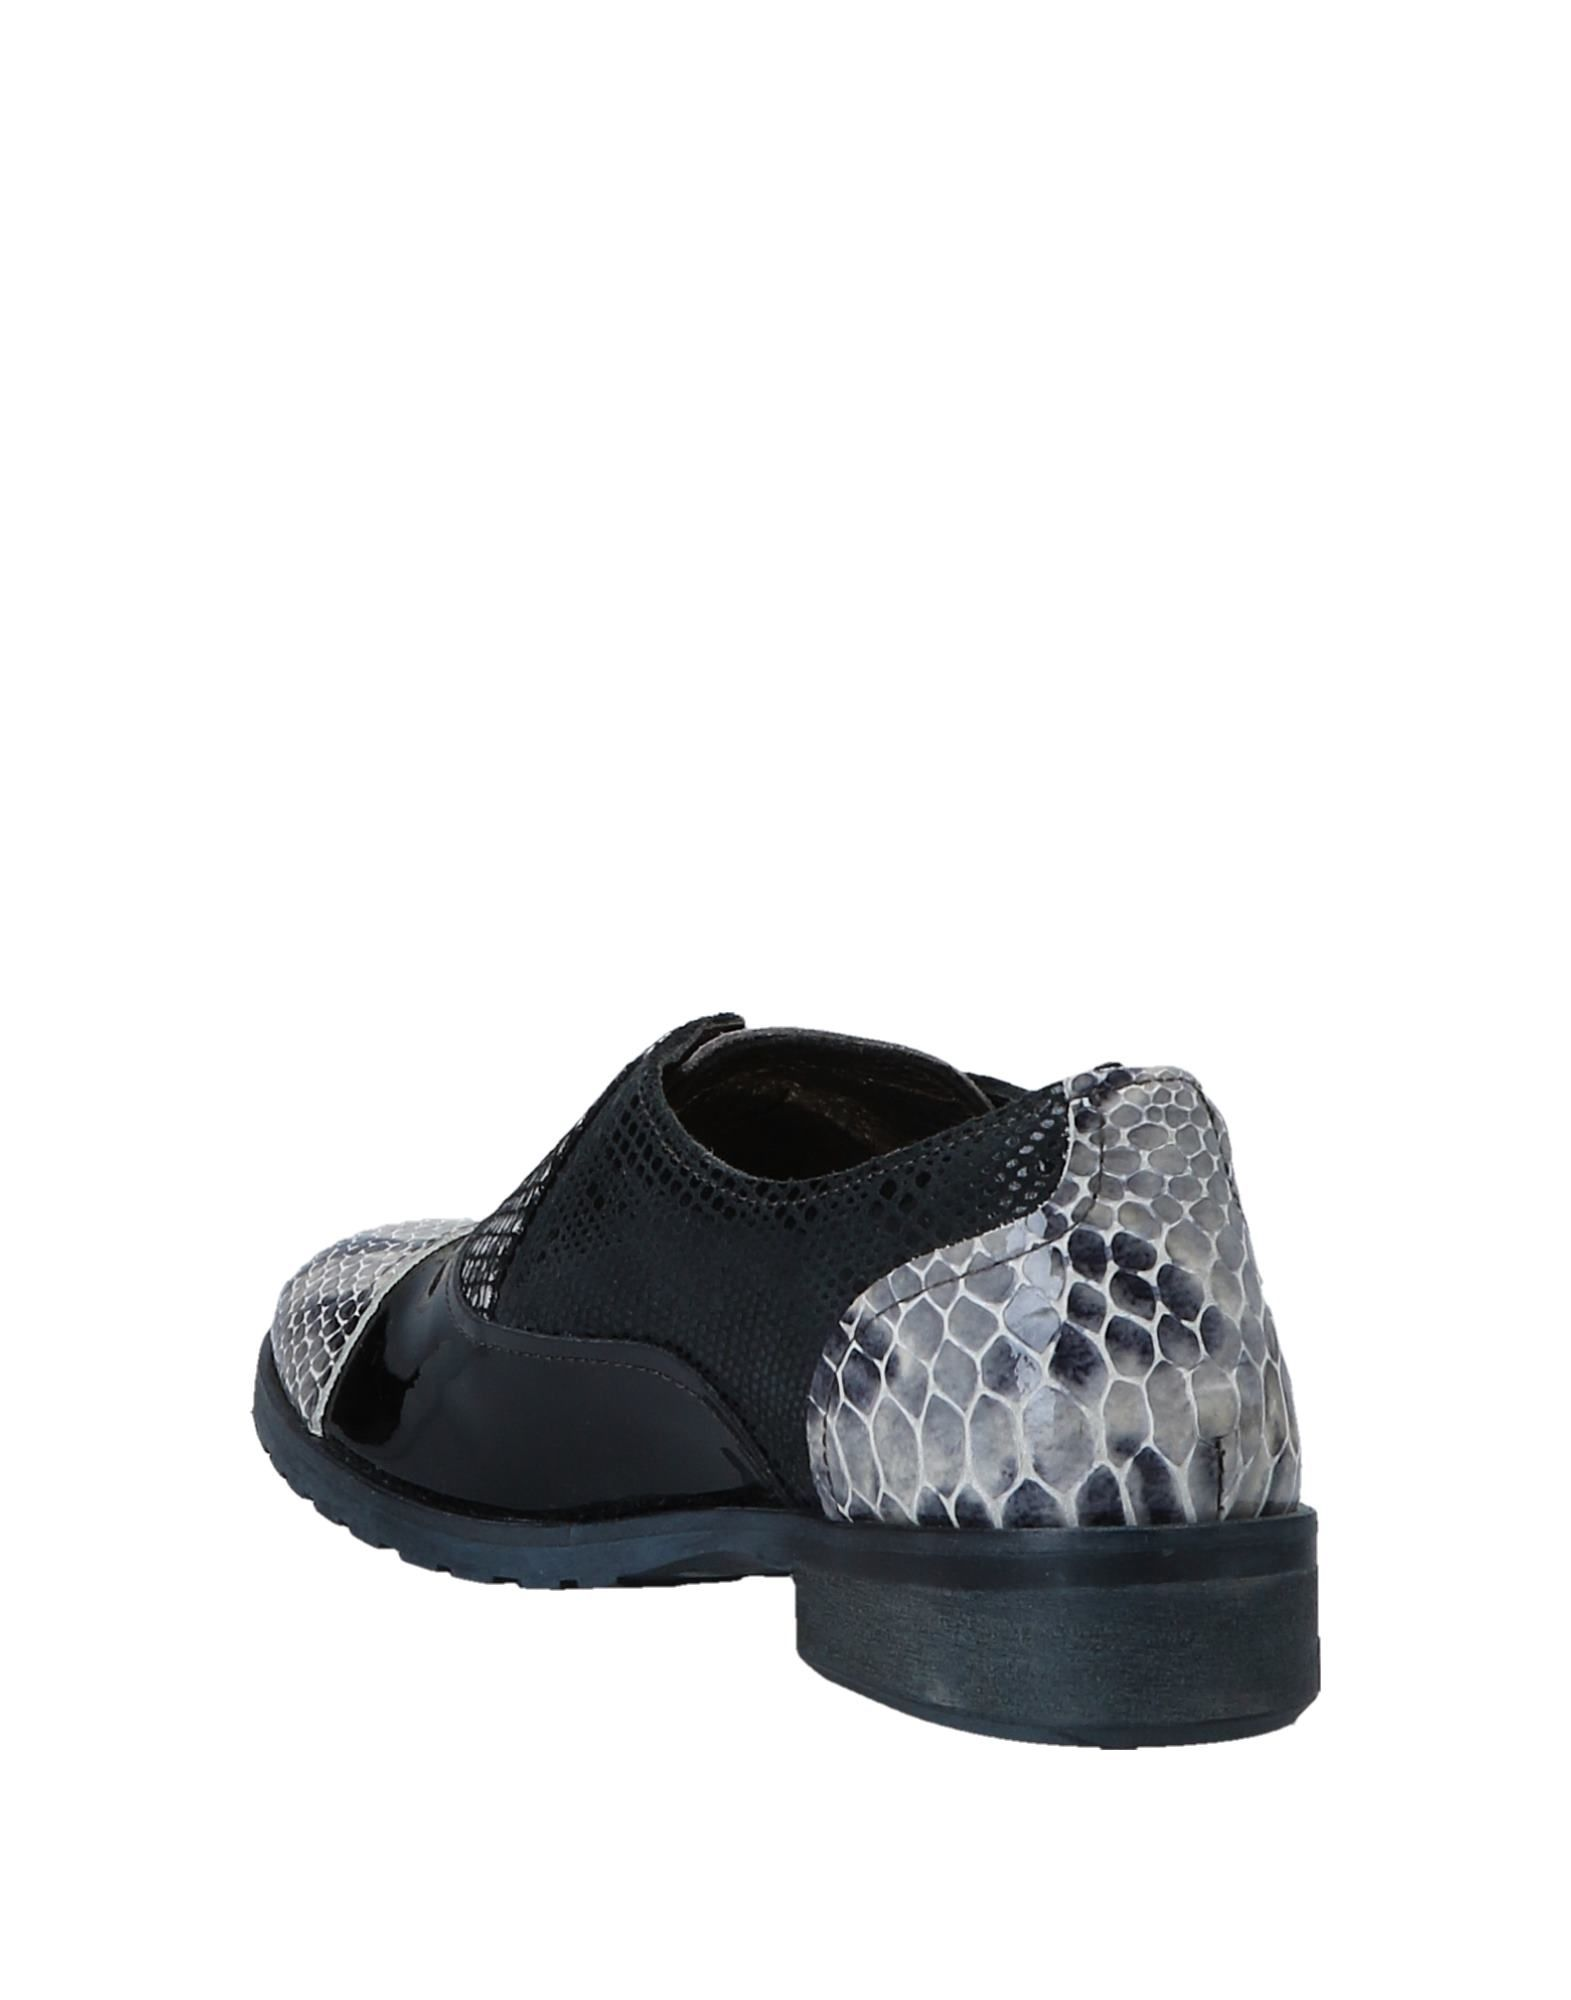 Ebarrito Gute Mokassins Damen  11555203OG Gute Ebarrito Qualität beliebte Schuhe cdc43c